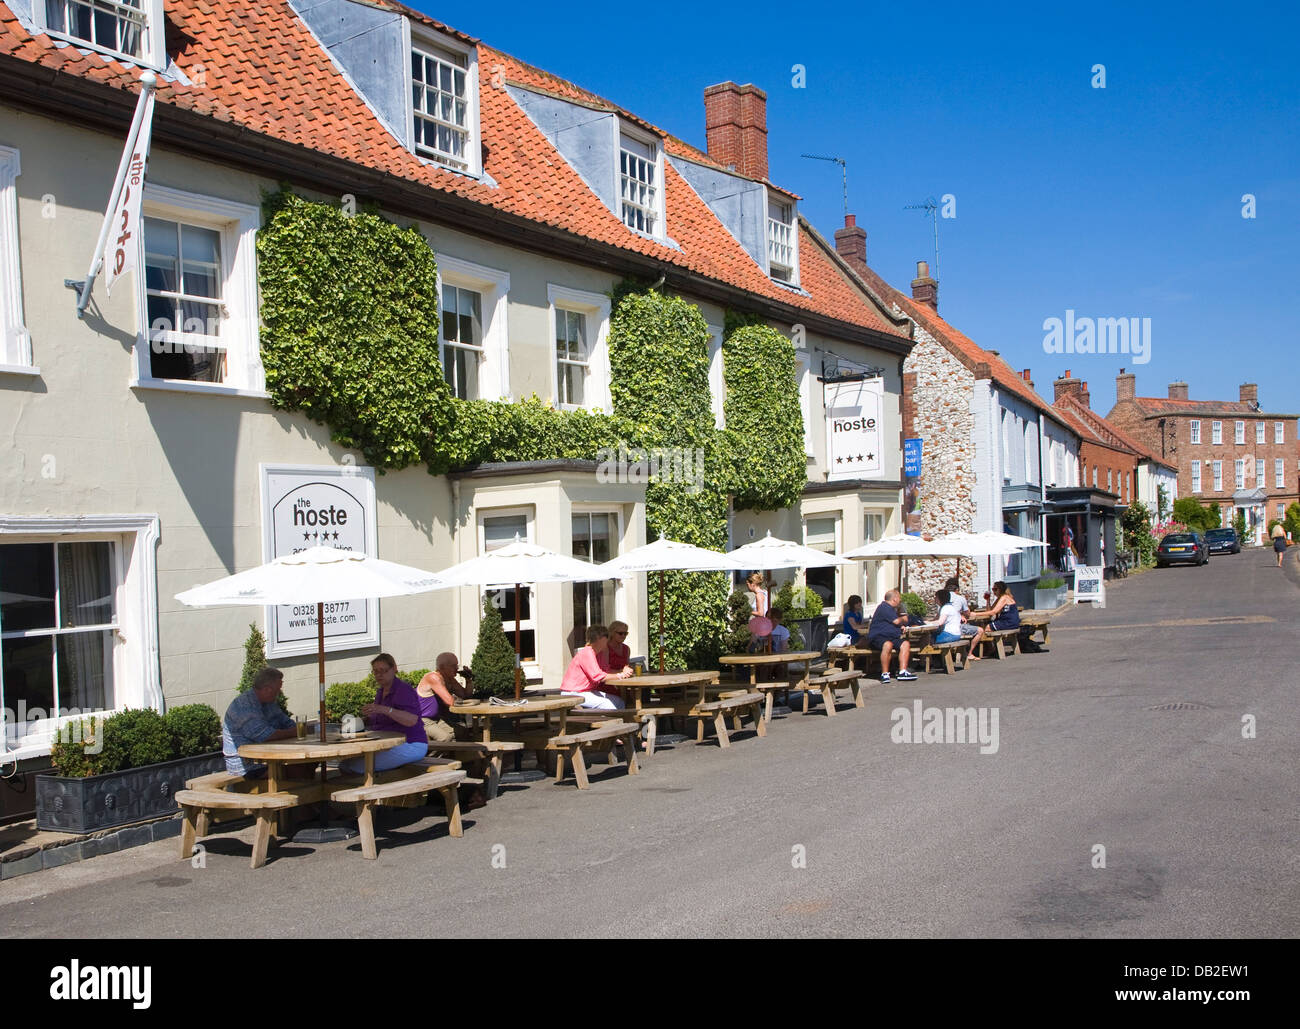 The Hoste, Burnham Market, Norfolk